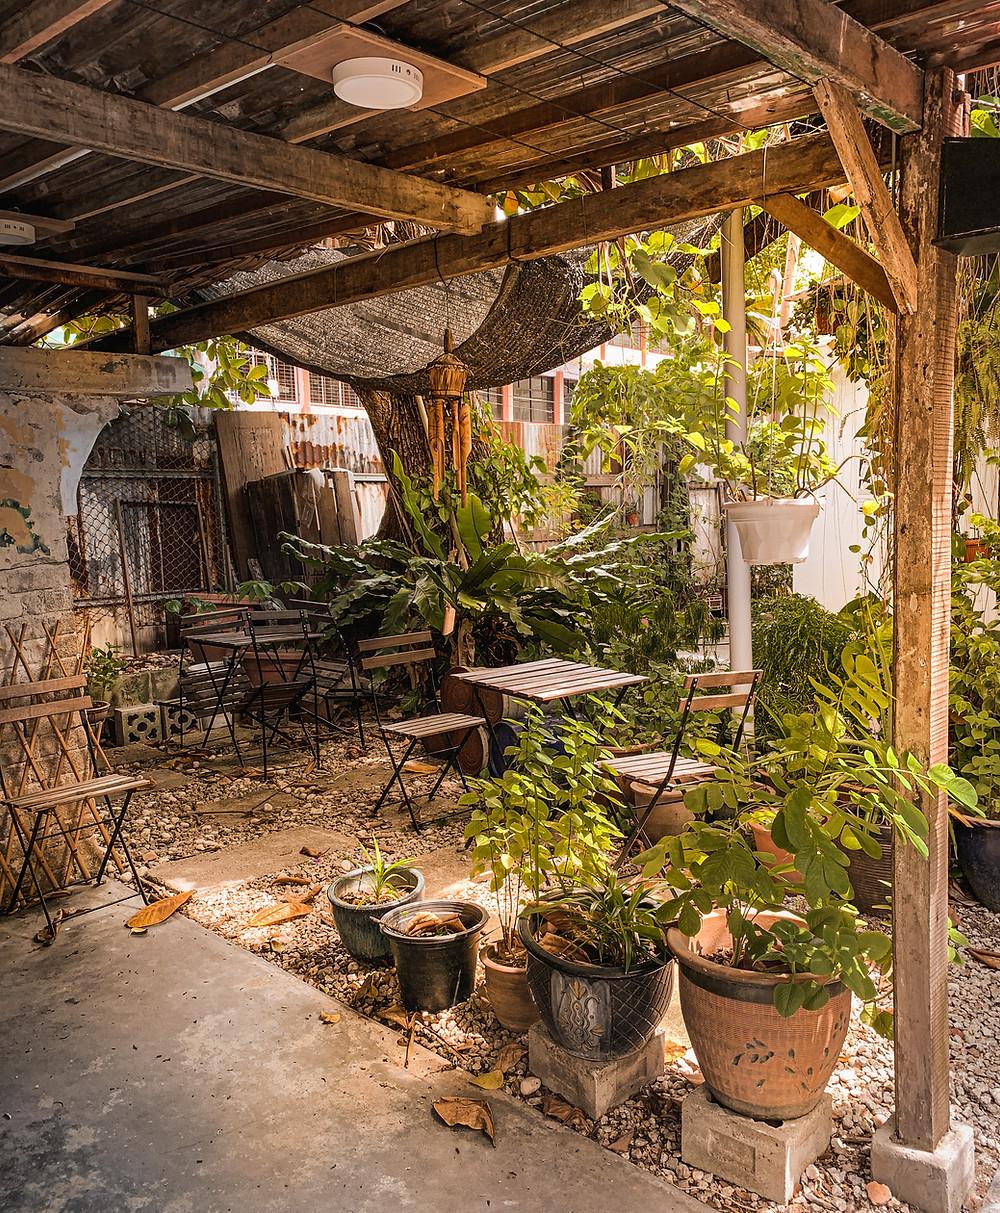 Rustic timber shelter, wooden picnic furniture, Hin Bus Depot garden deck, RollingBear Travels blog.